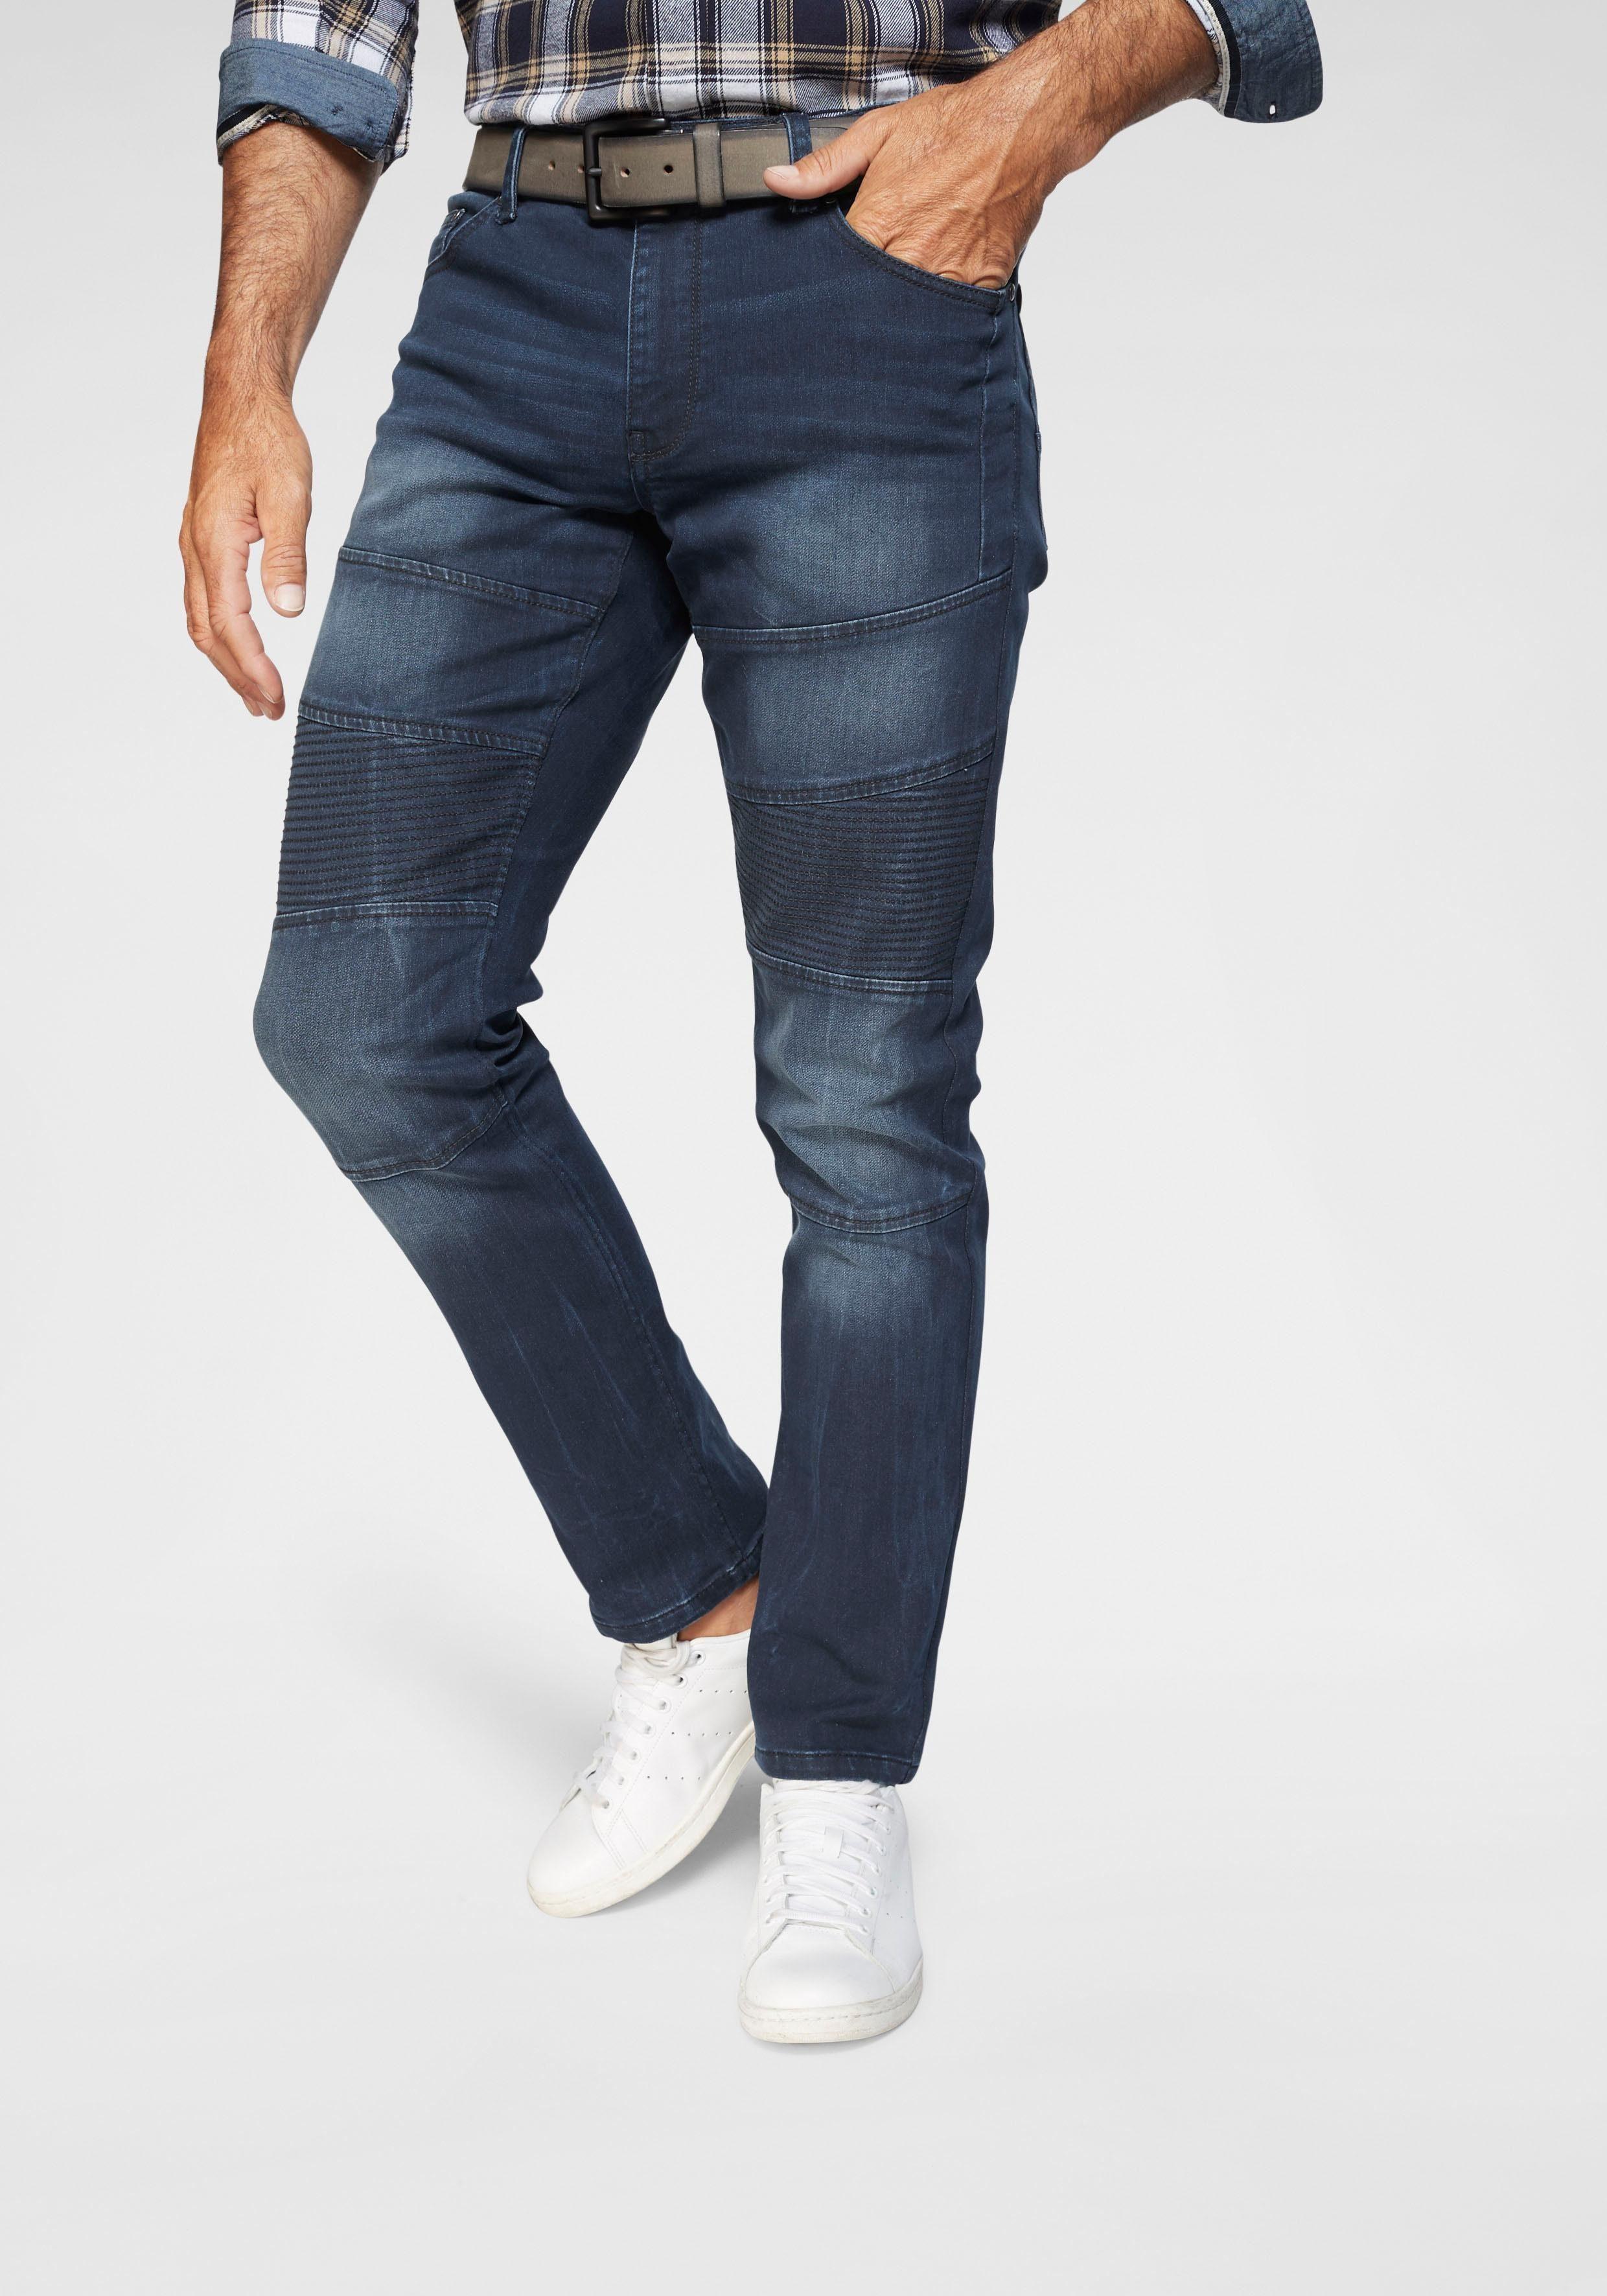 Image of Arizona 5-Pocket-Jeans, mit Abnähern